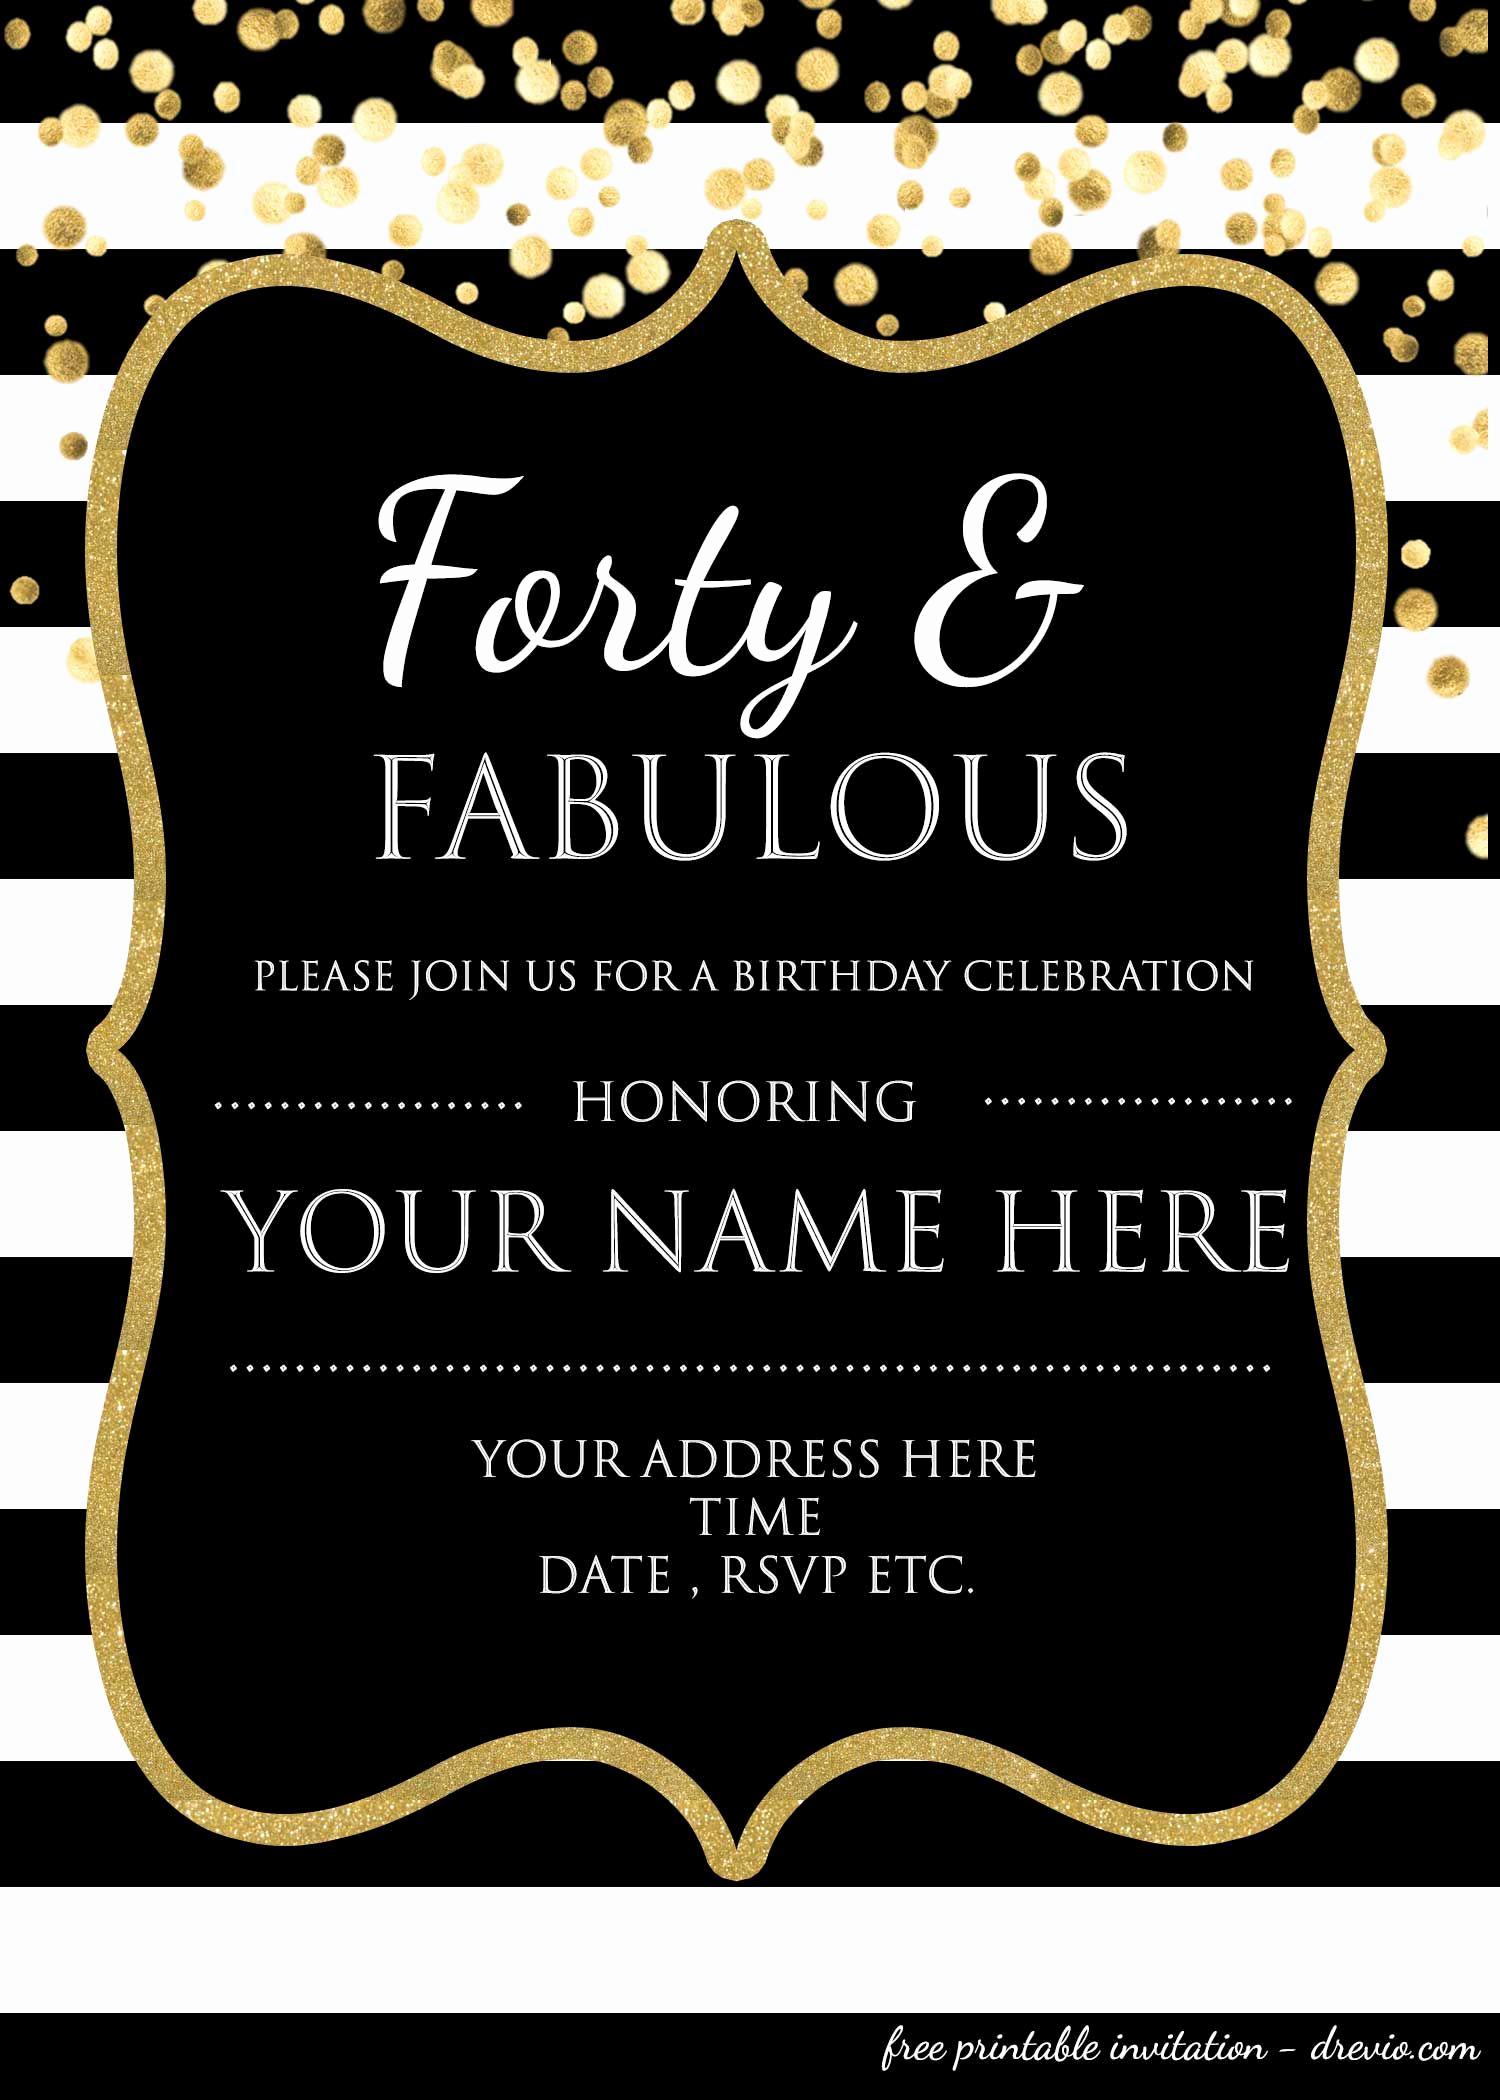 Free Anniversary Invitation Templates Elegant forty & Fabulous 40th Birthday Invitation Template Psd